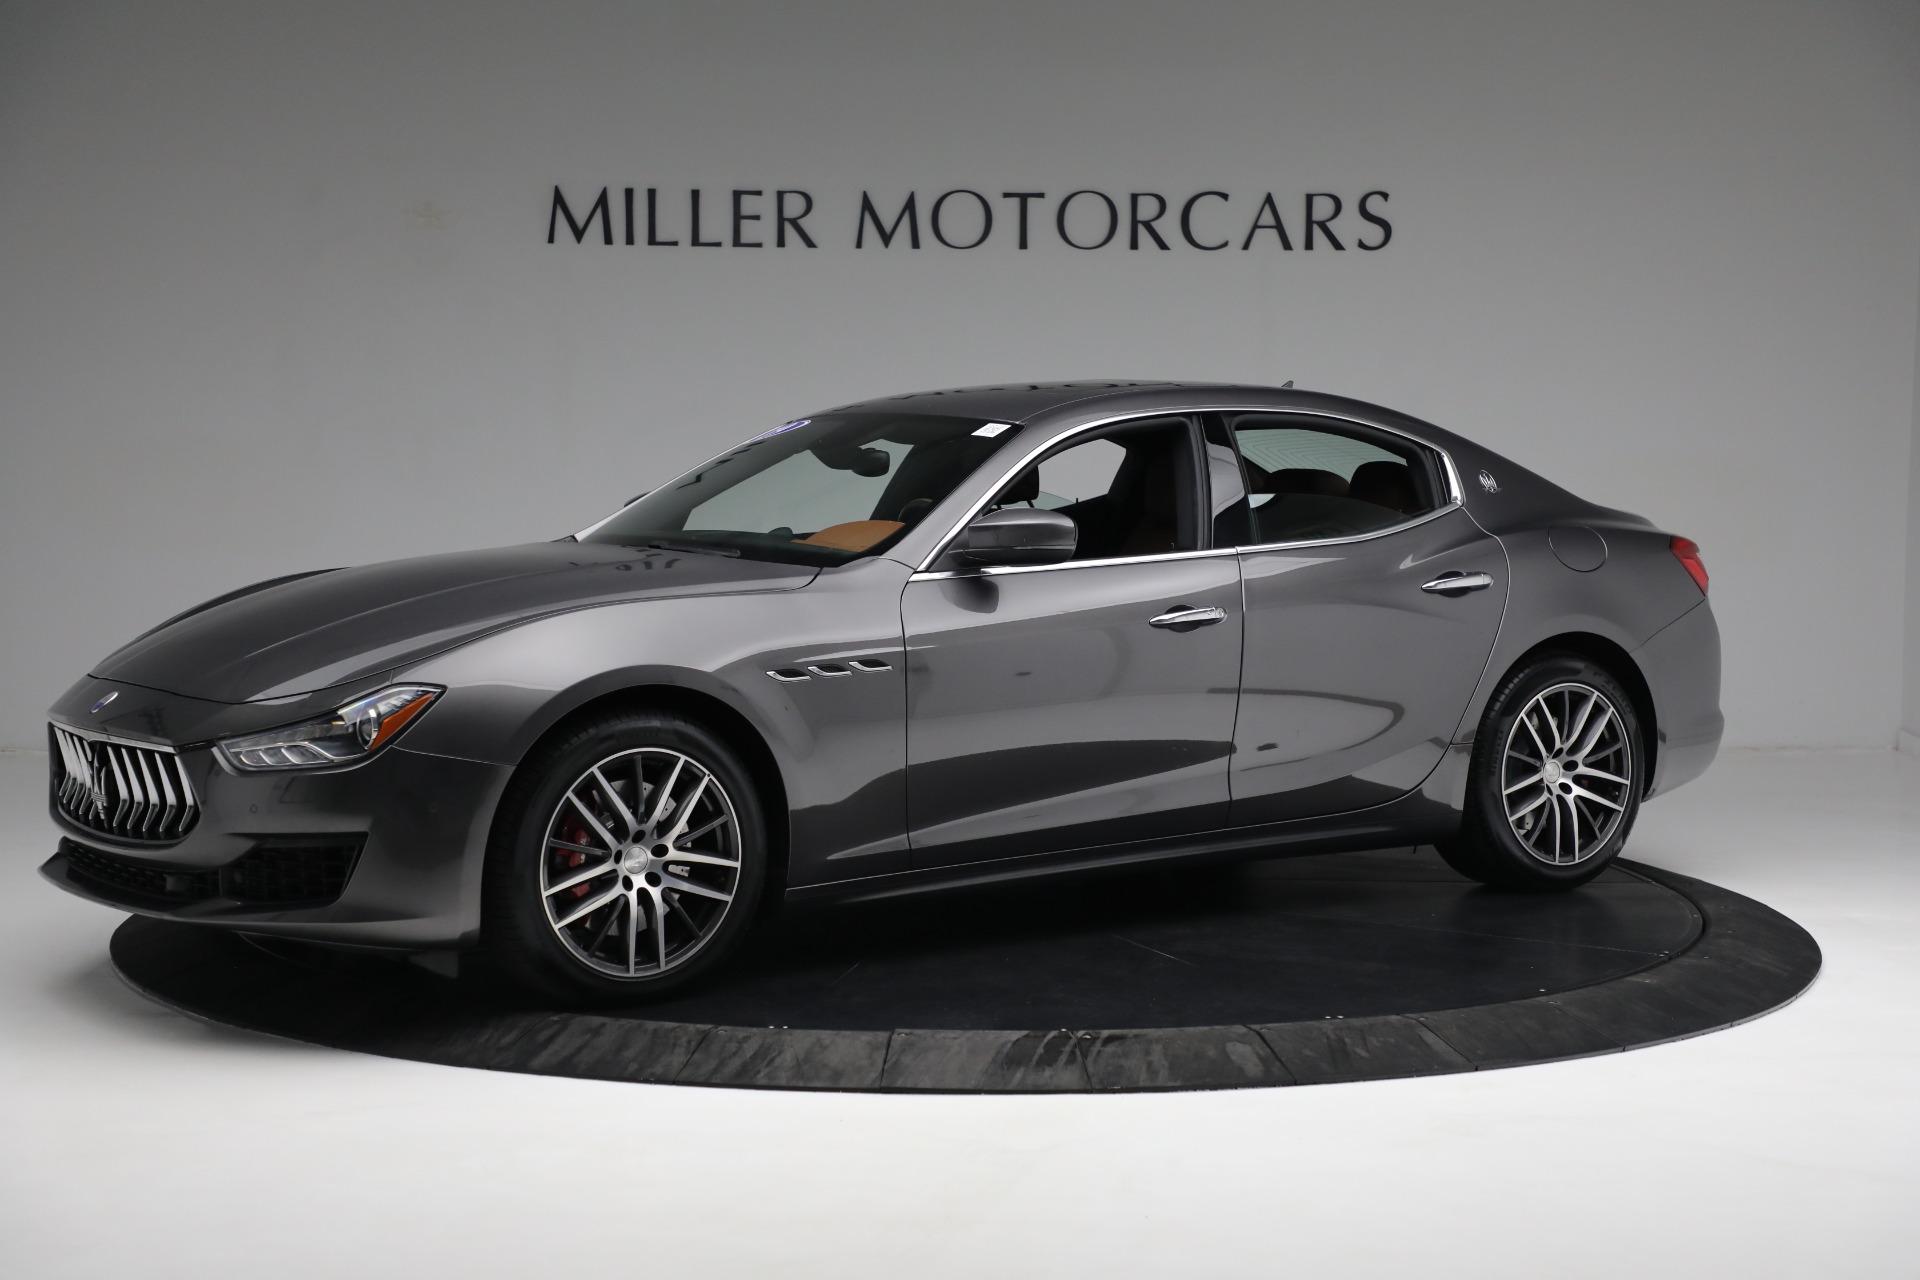 New 2019 Maserati Ghibli S Q4 For Sale In Westport, CT 3019_p2